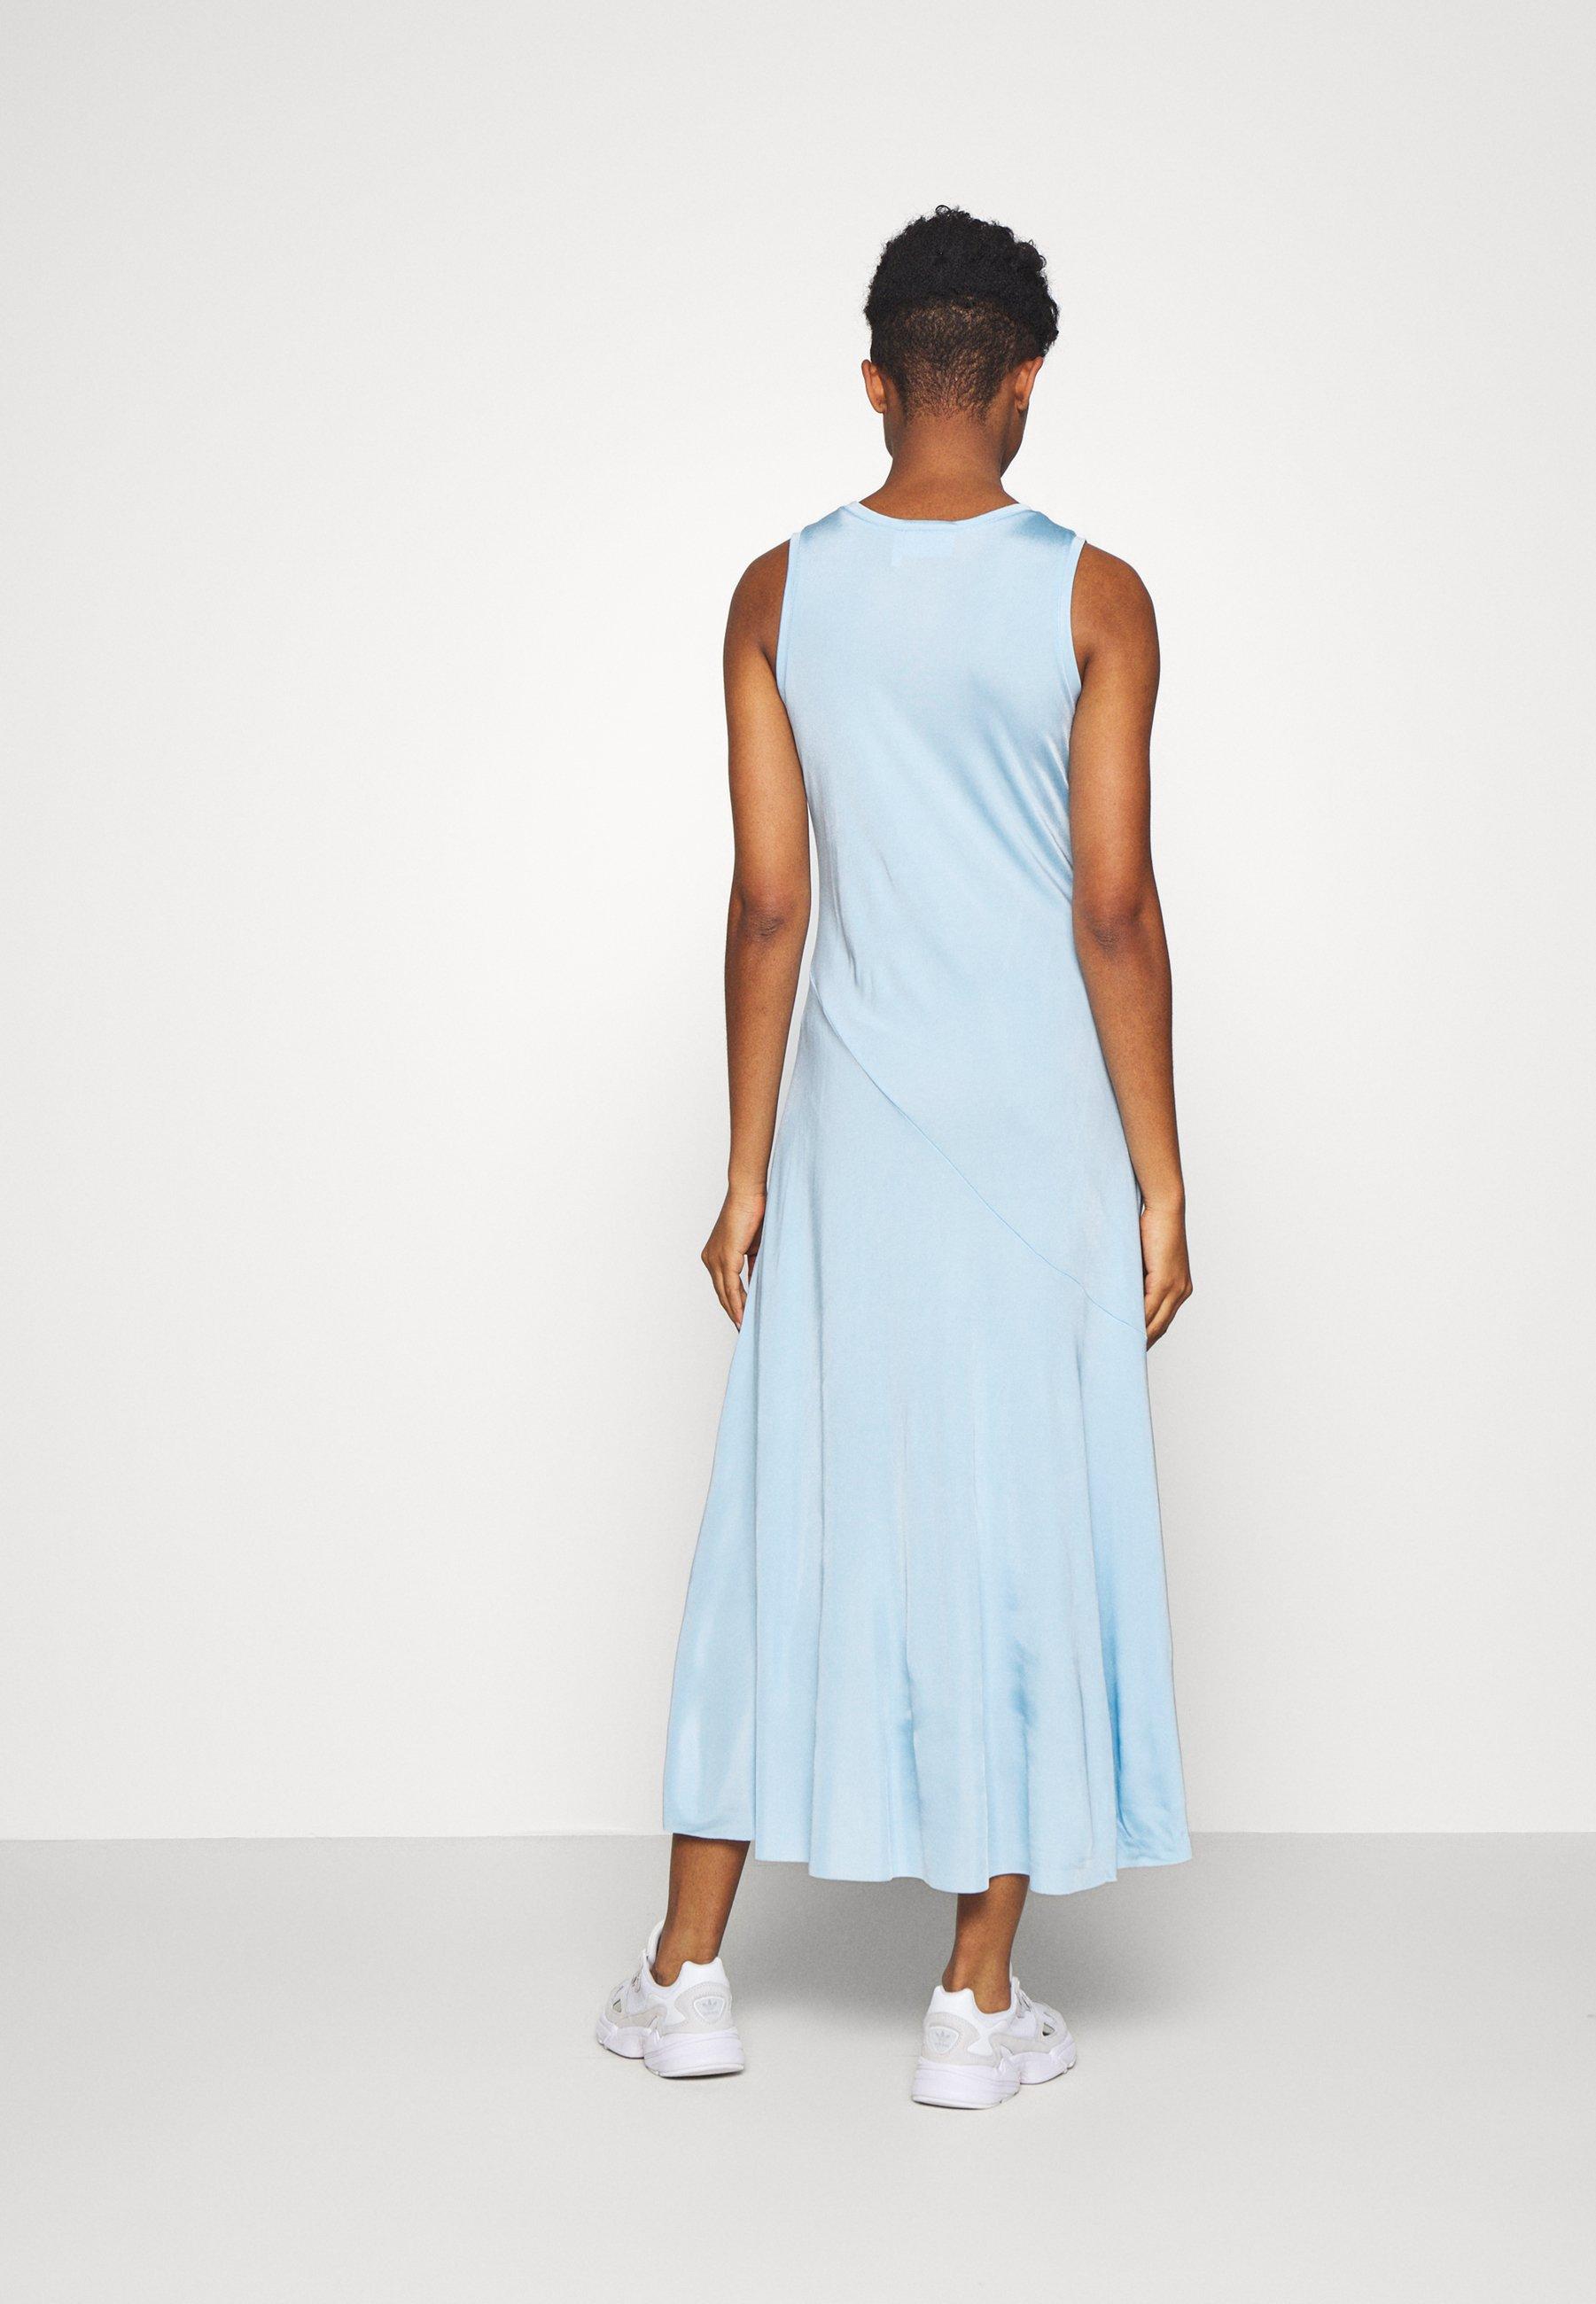 Weekday RAKEL DRESS - Robe en jersey - light blue - Robes femme p2rRM